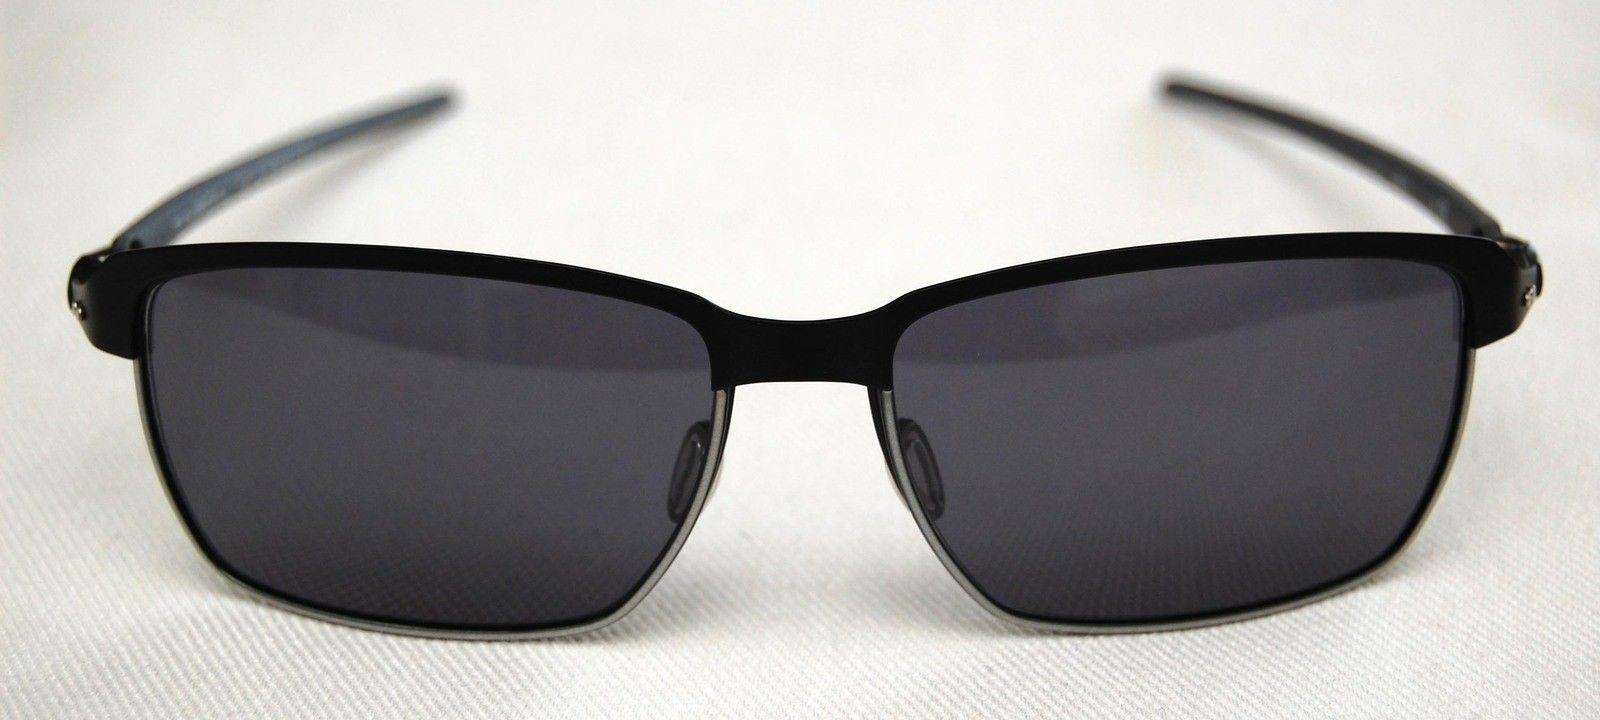 Tinfoil Carbon OO6018-01 Matte Black / Silver   Grey Lens - 01.jpg